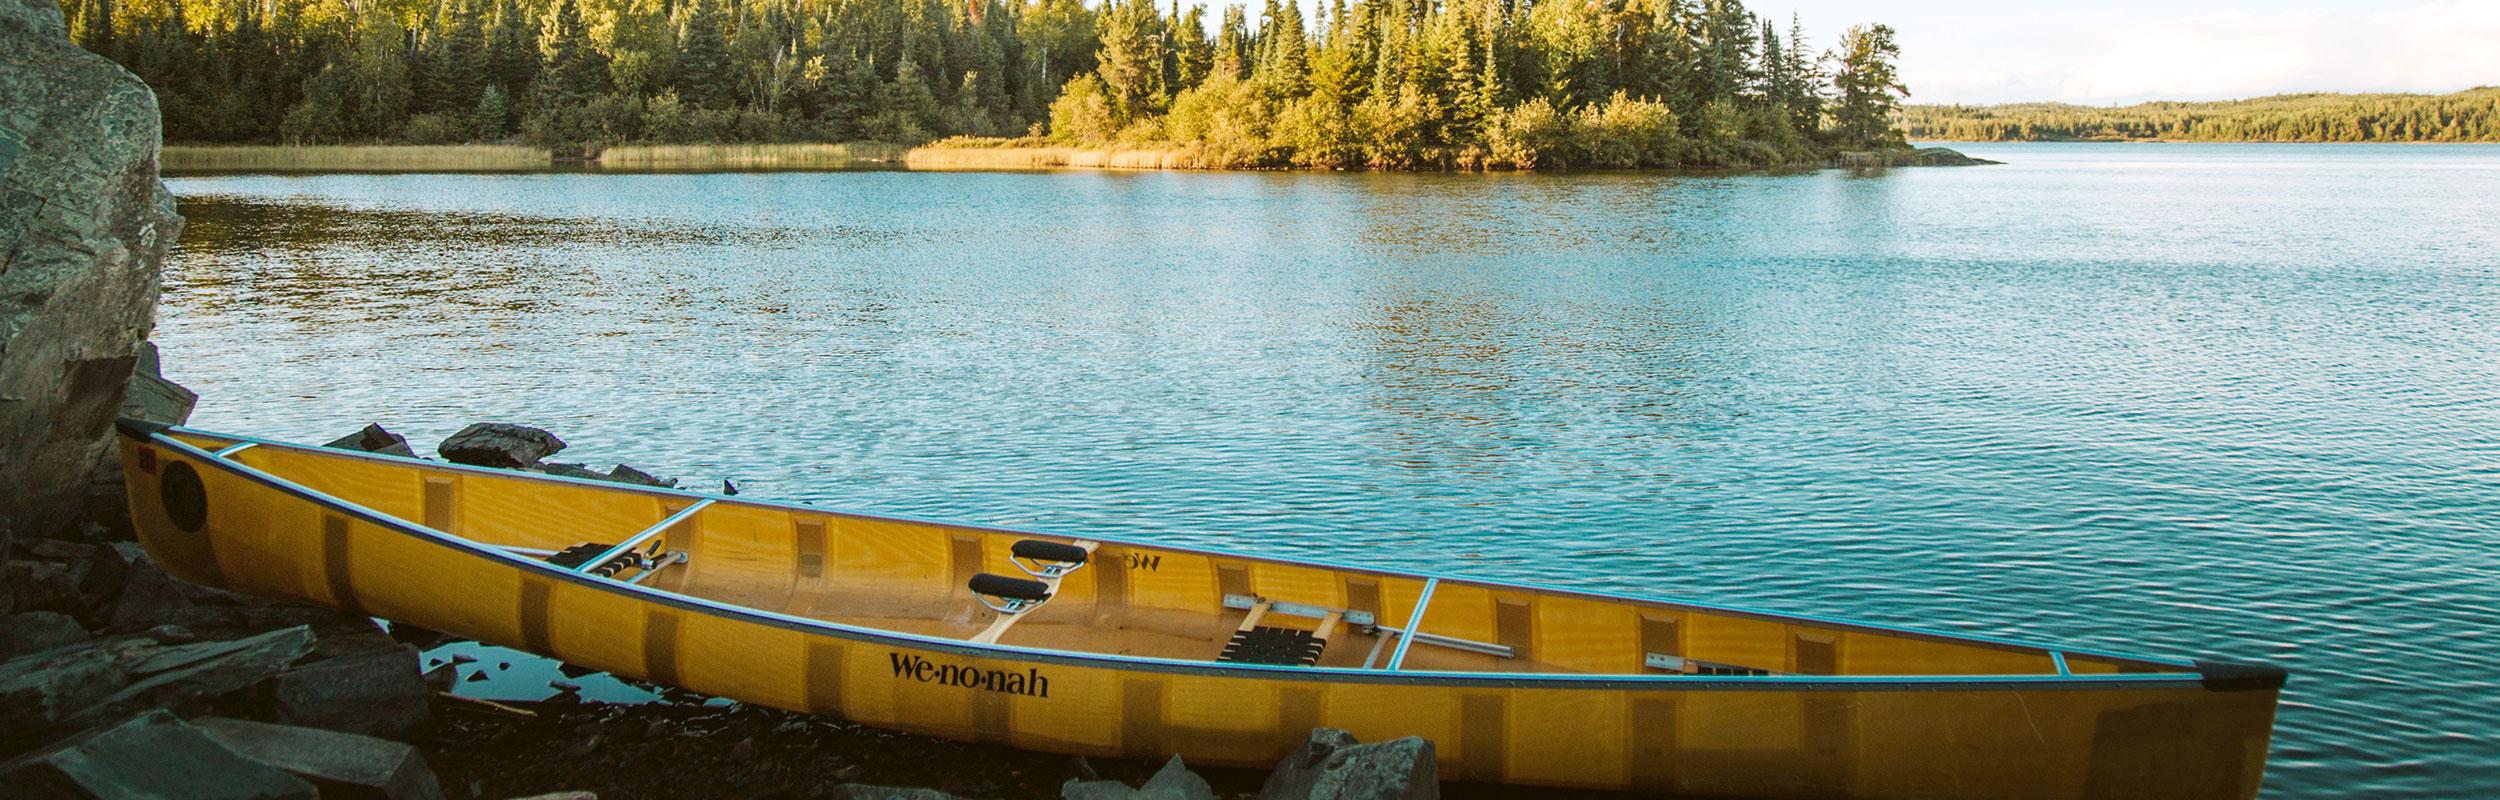 Canoe by a lake in Chanhassen, Minnesota